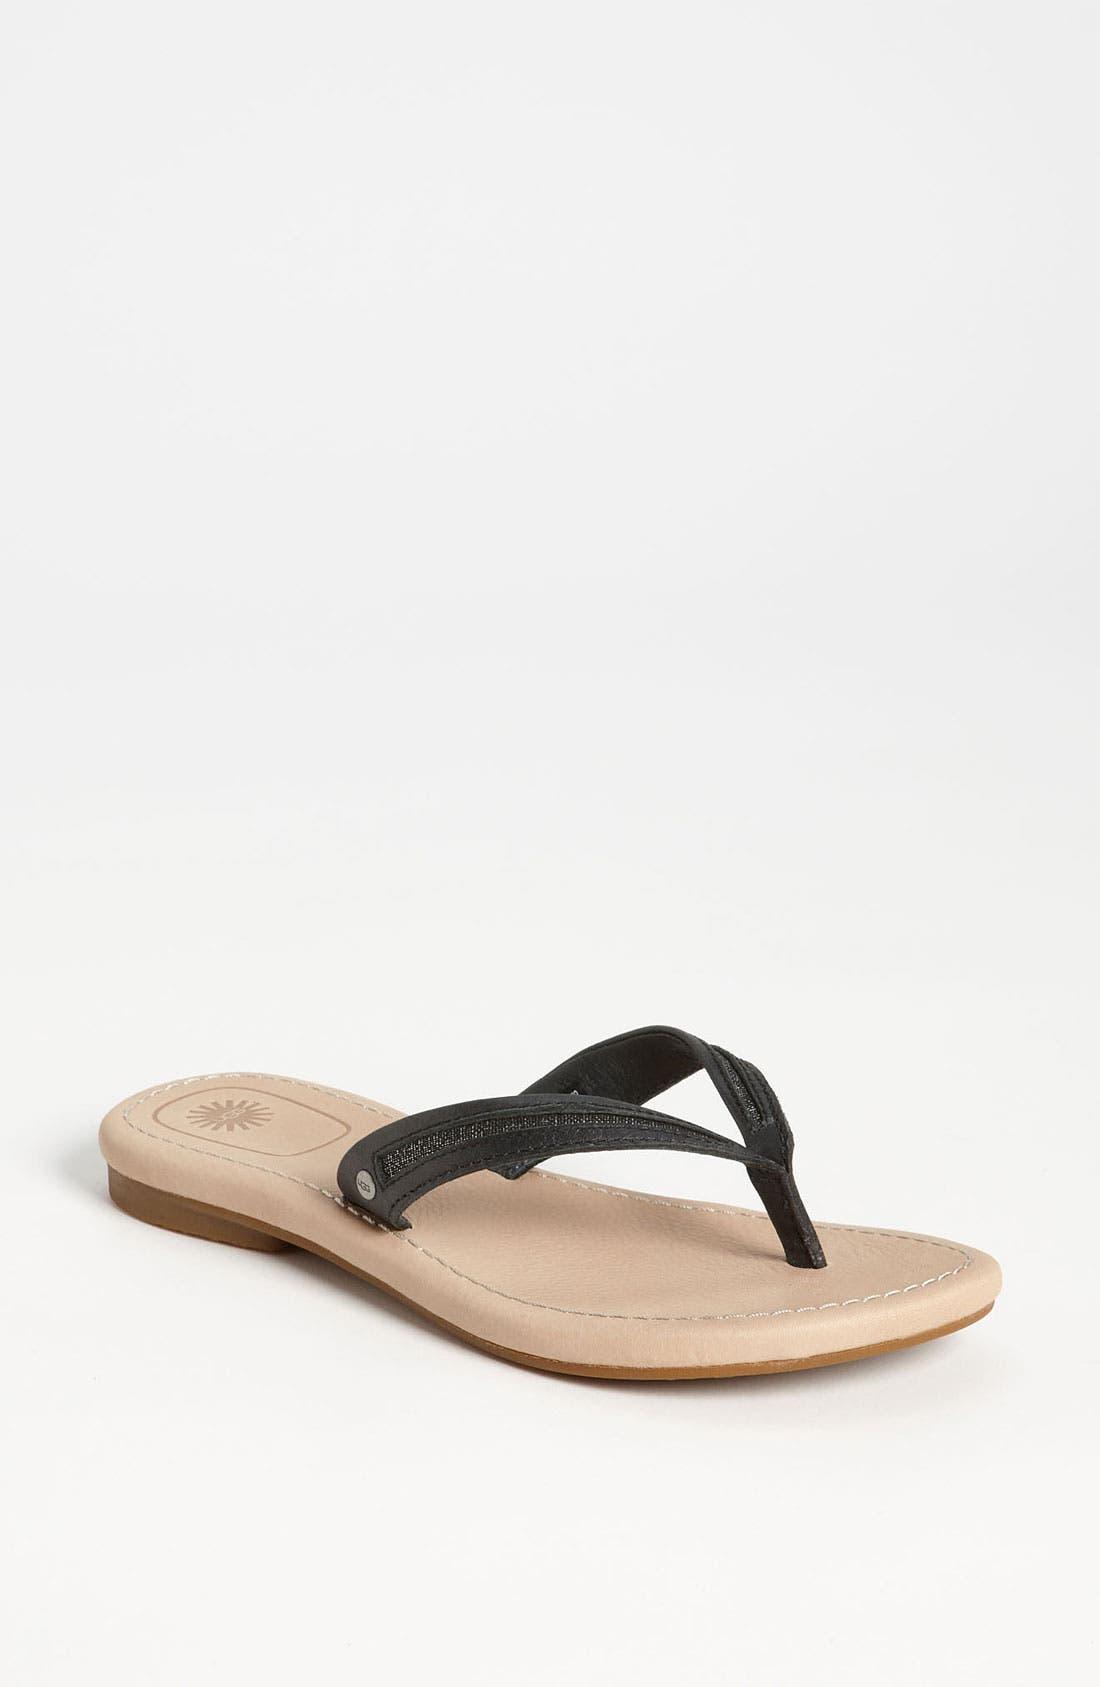 Main Image - UGG® Australia 'Elyza II' Sandal (Women)